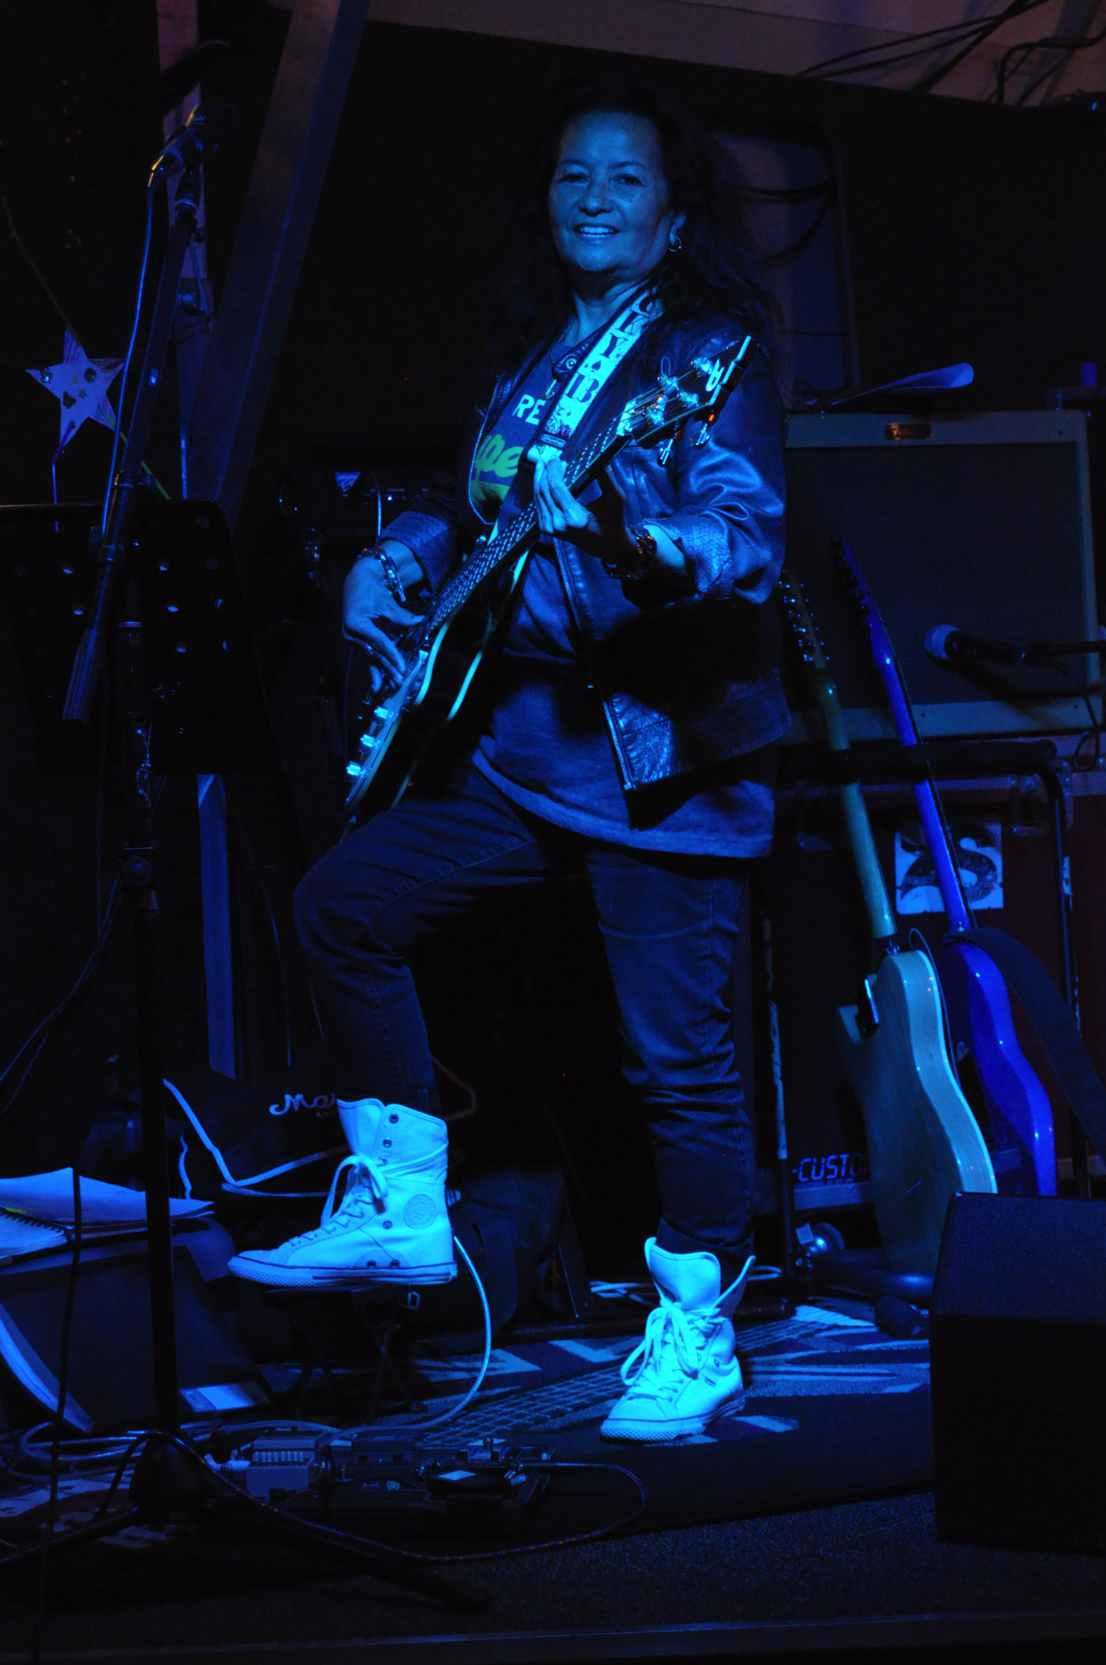 Angie feestmuziek met Coverband Ziggy Stardust Experience Camping de quack